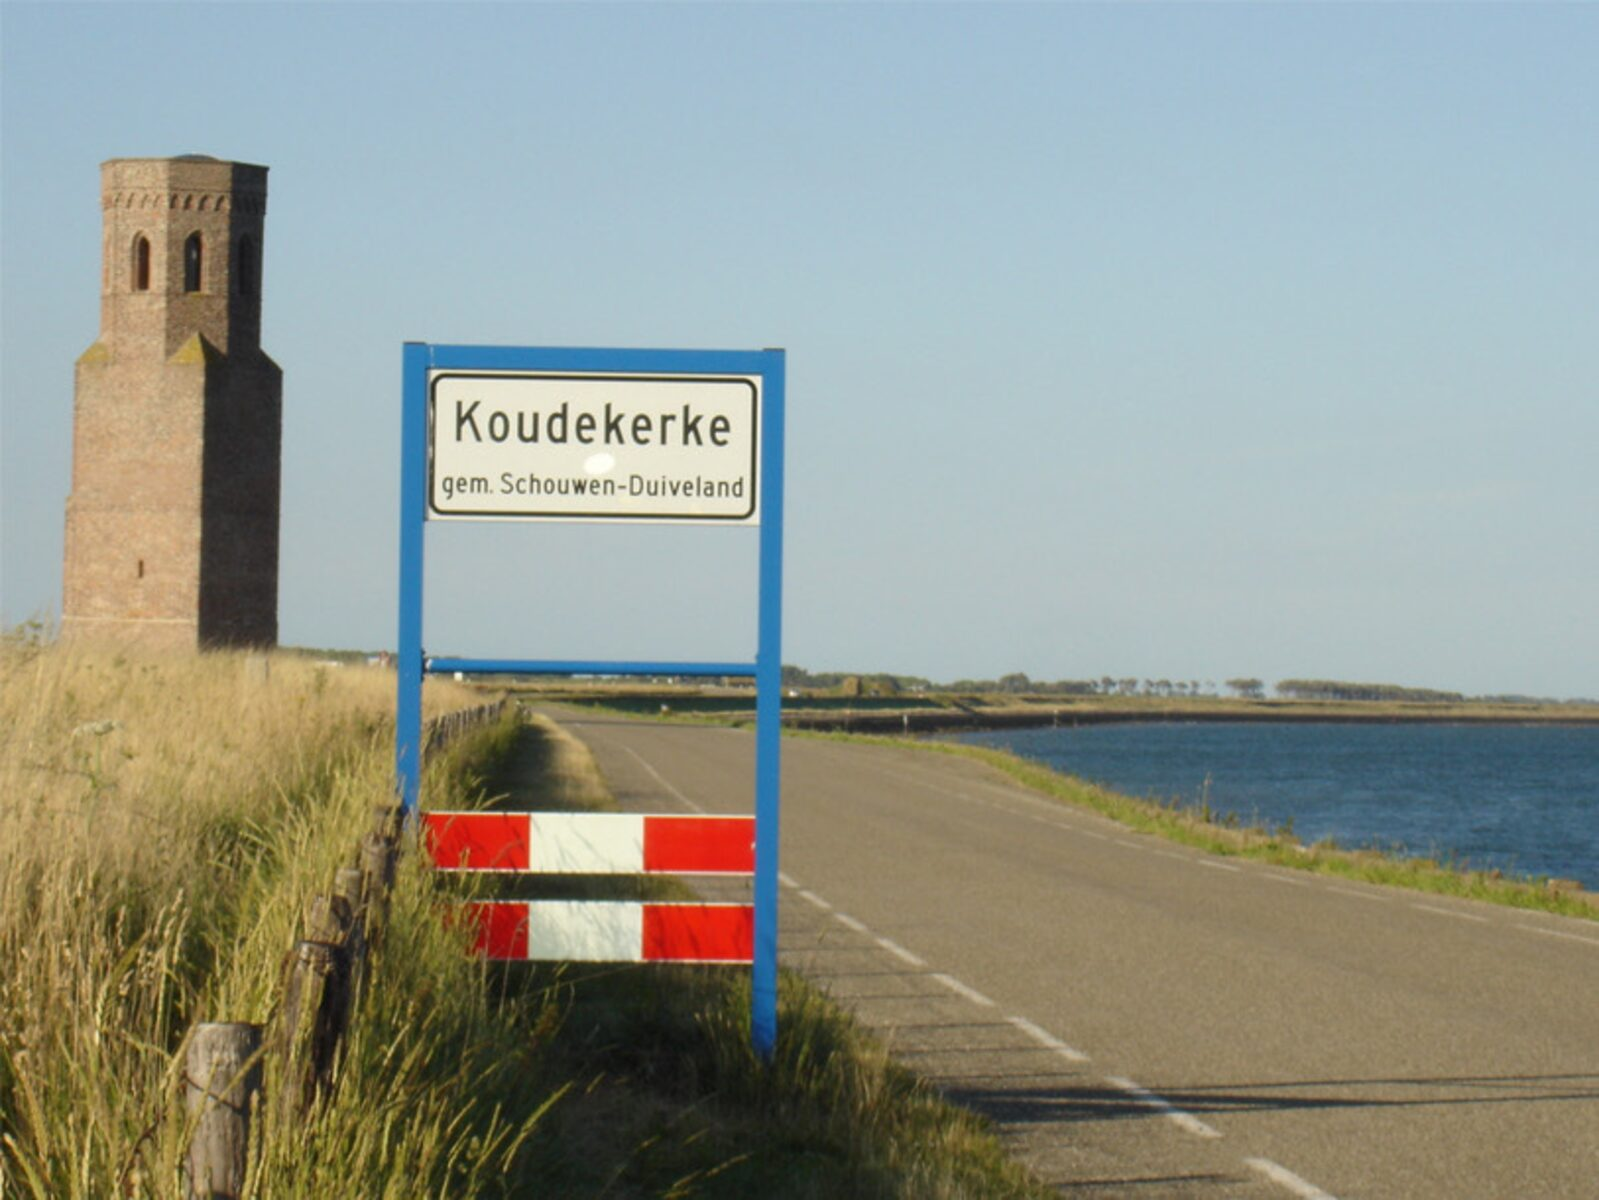 Holidayhome - Bosweg 25 | Burgh-Haamstede